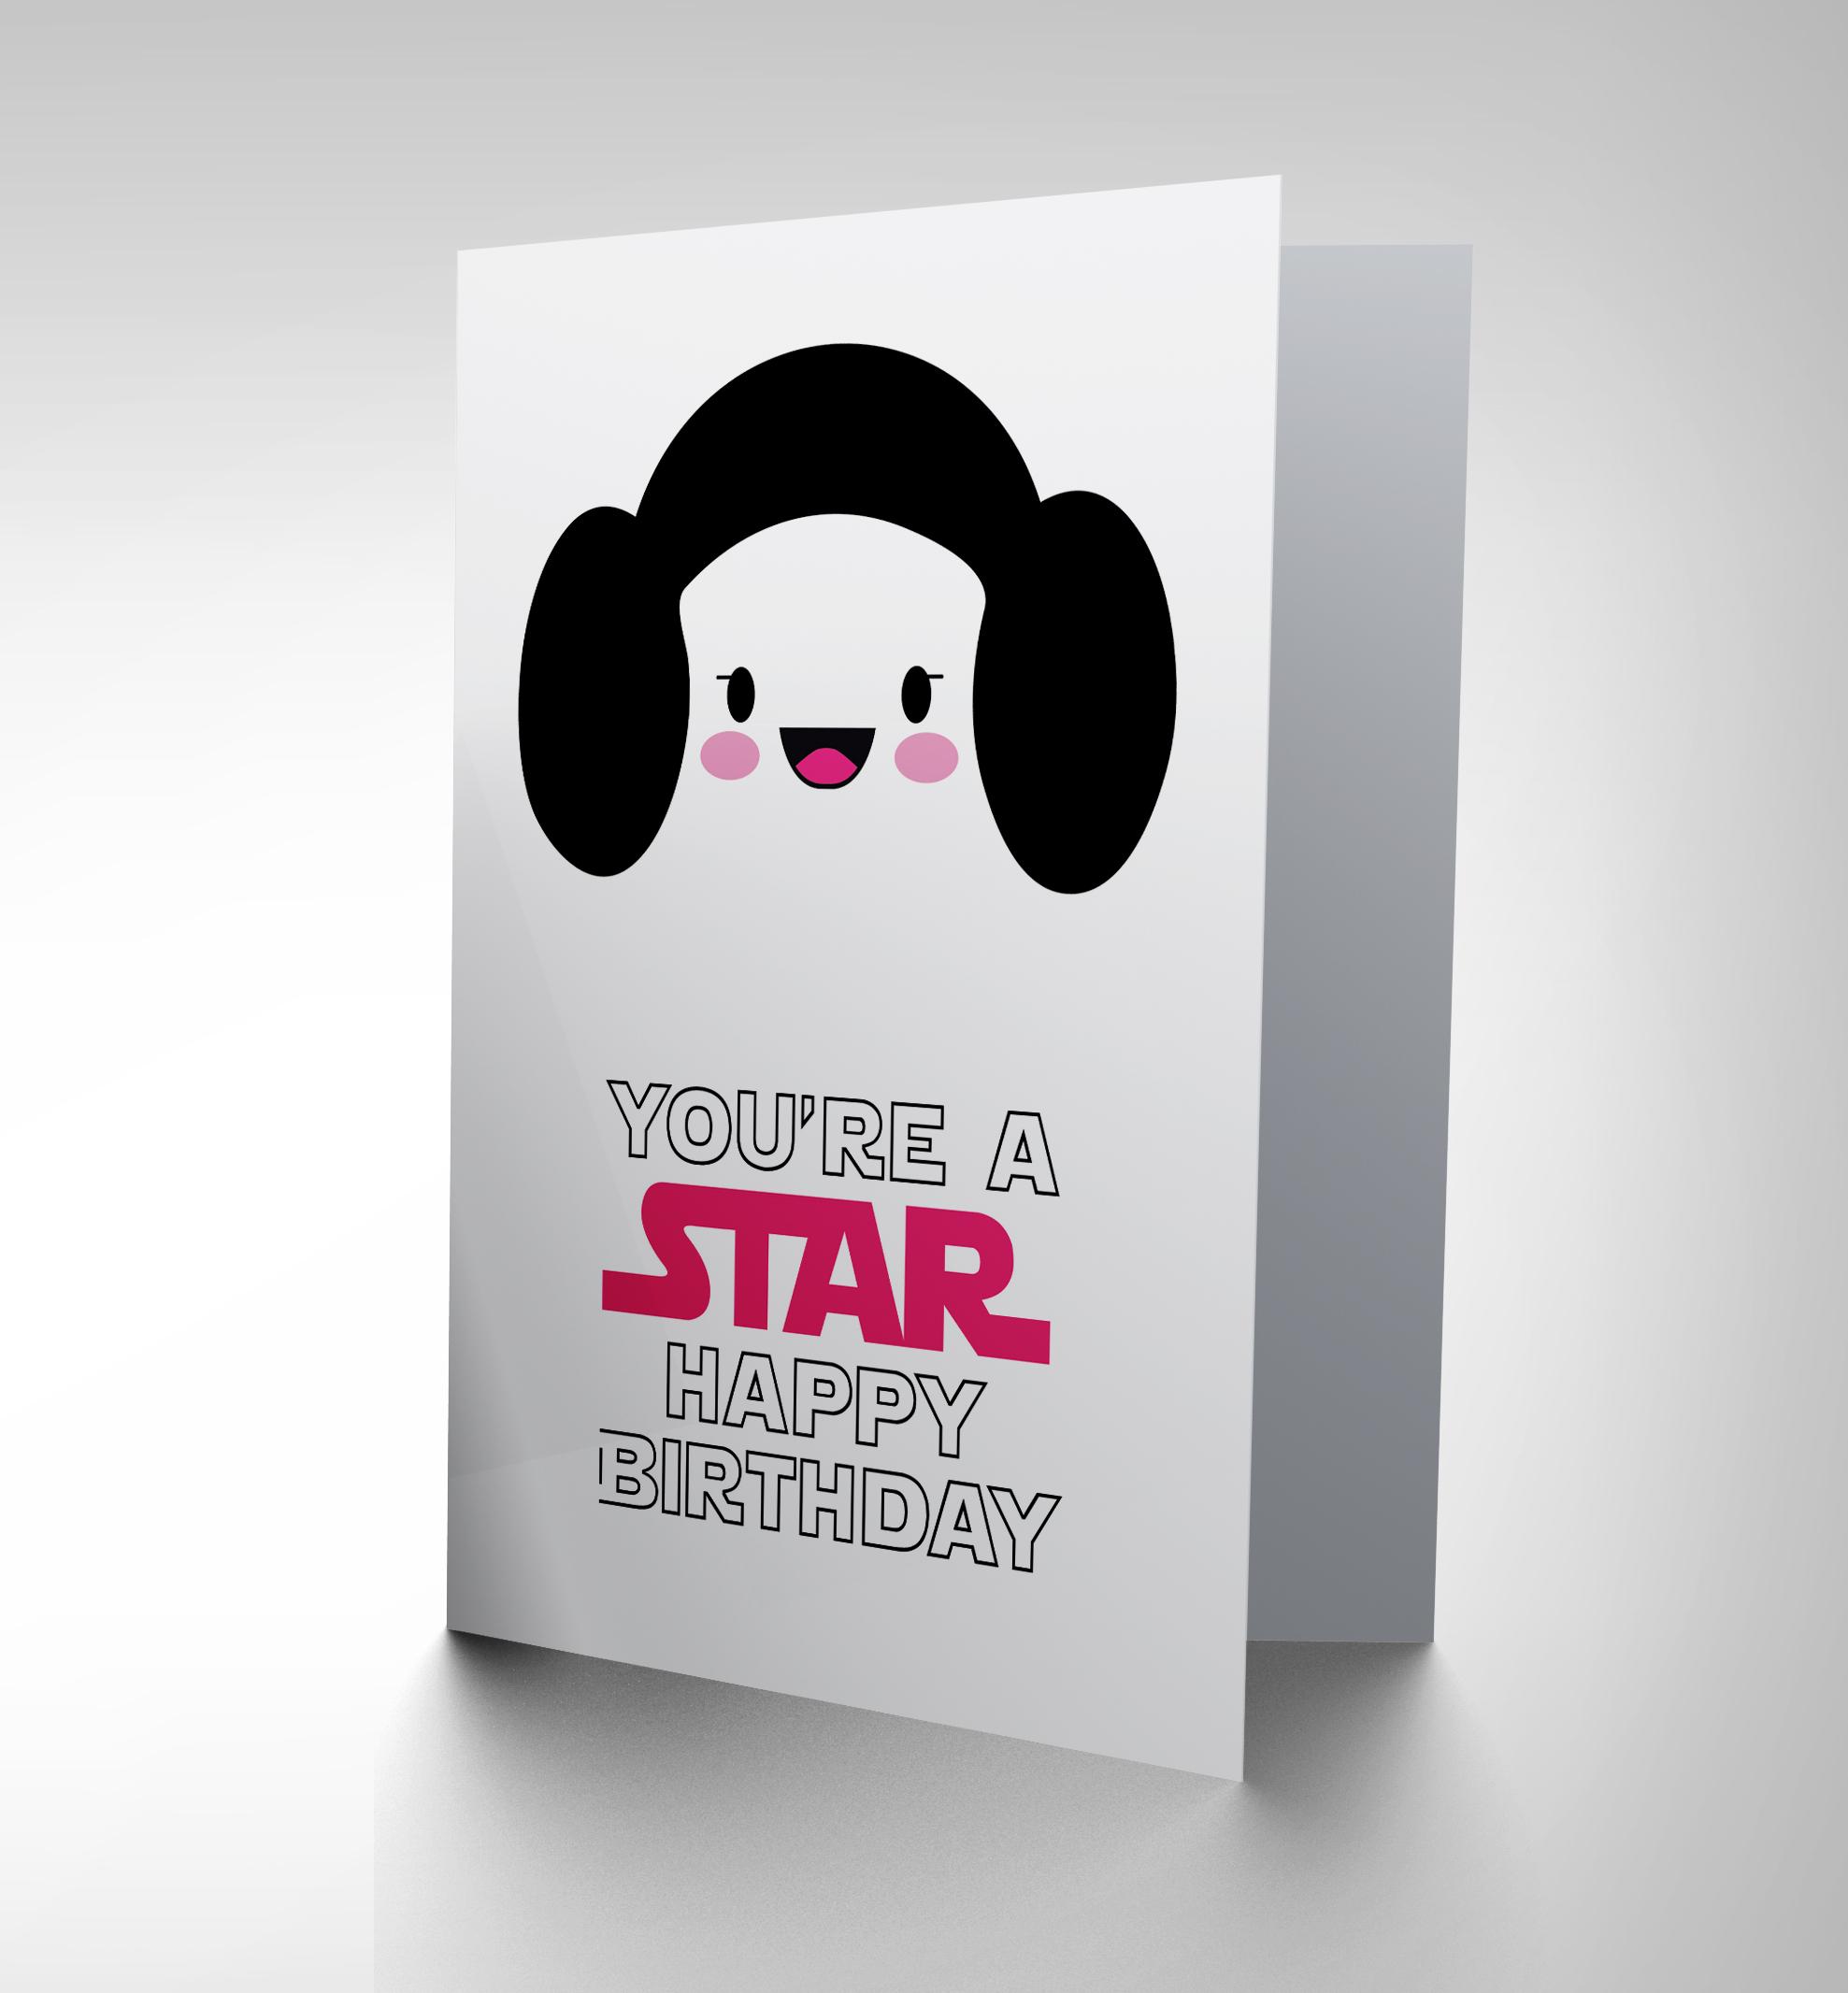 CARD BIRTHDAY HAPPY PRINCESS LEIA CARTOON STAR DESIGN GIFT CP2723